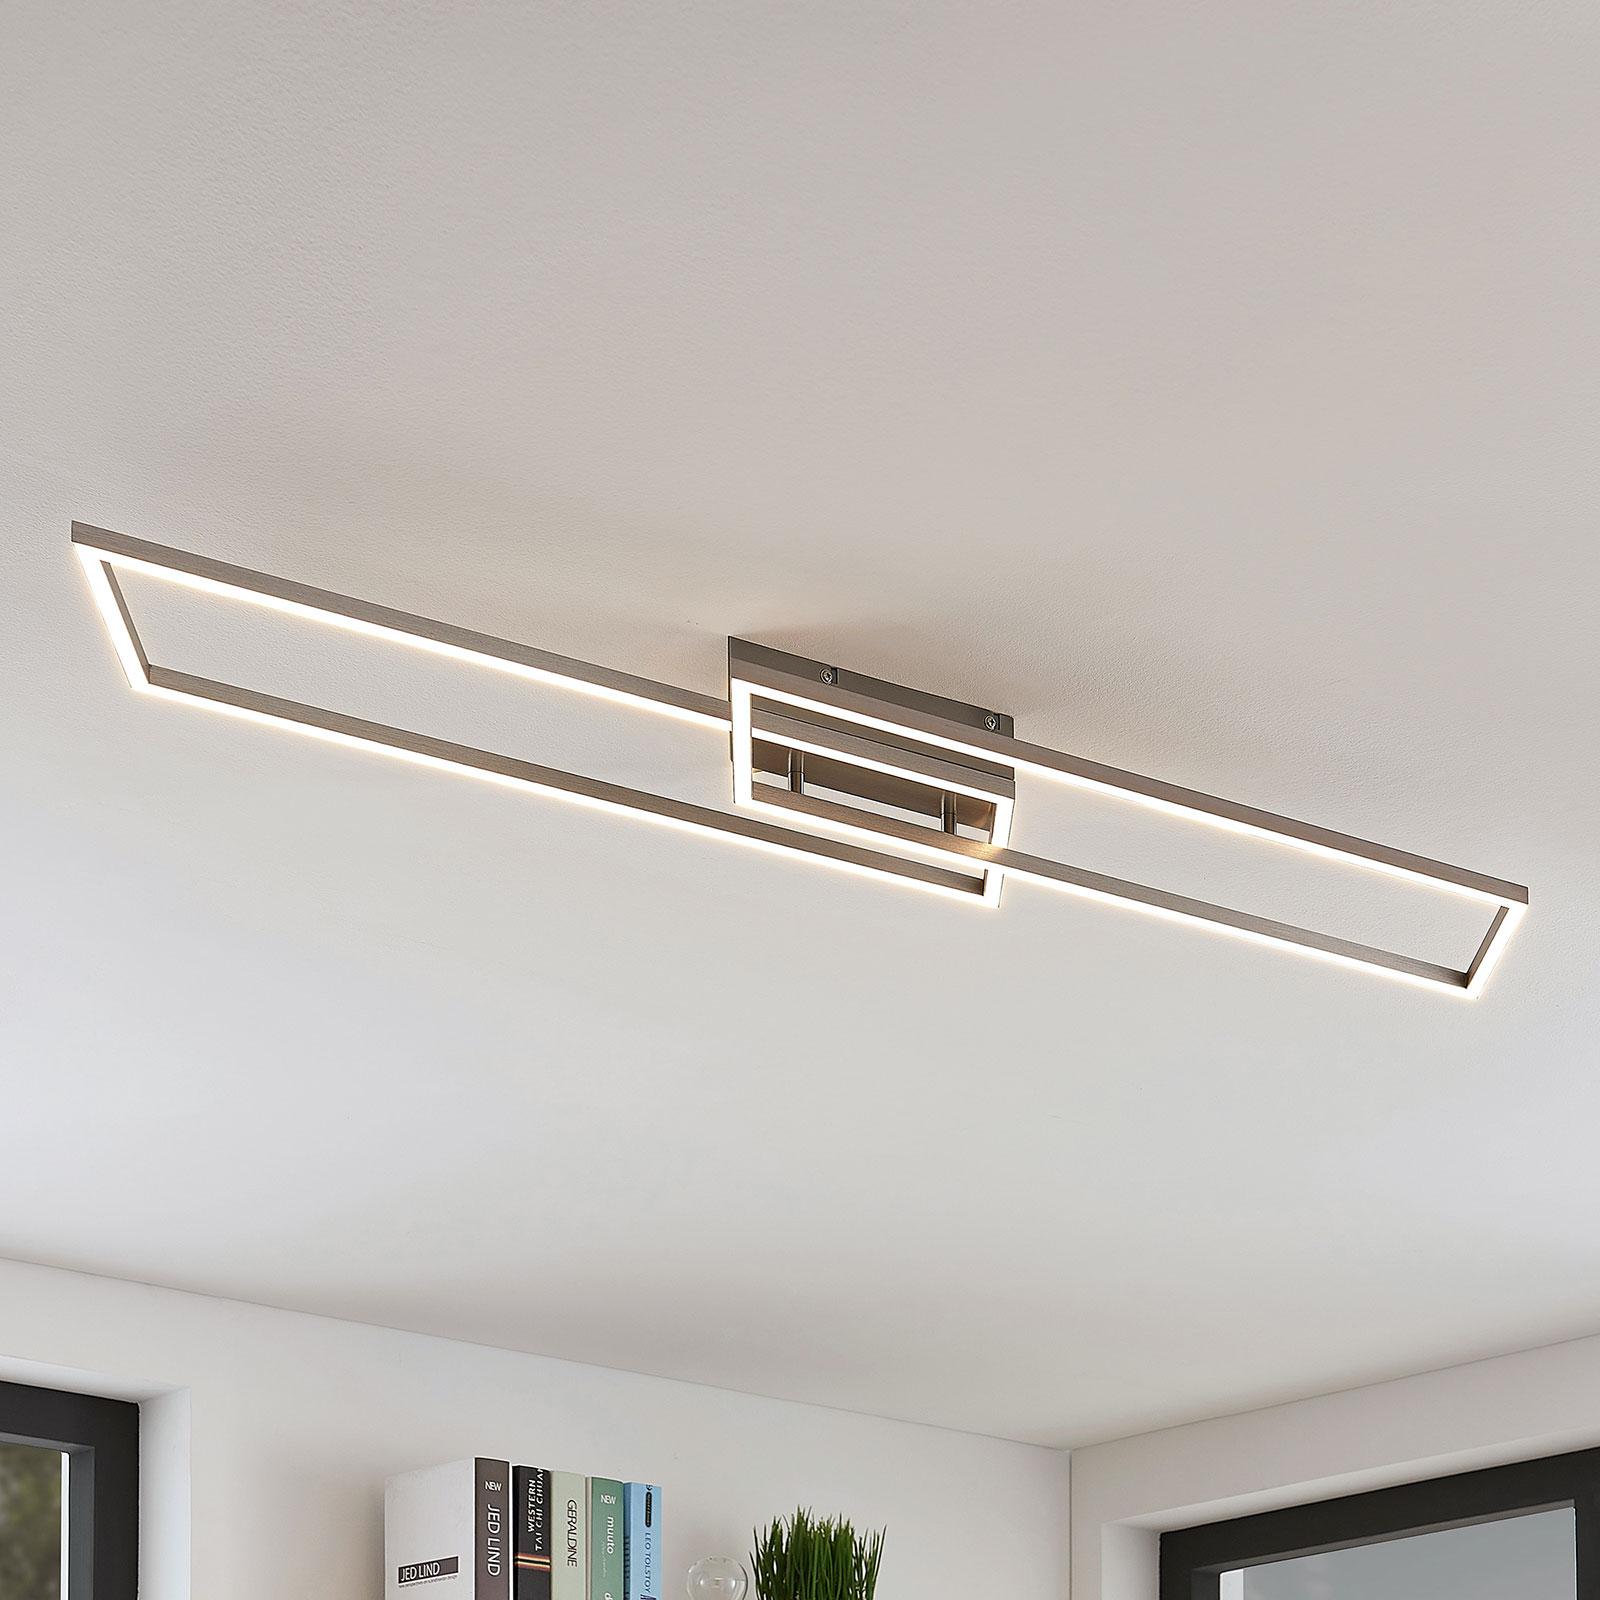 Plafonnier LED Quadra dimmable, 2 lampes, 113,2cm